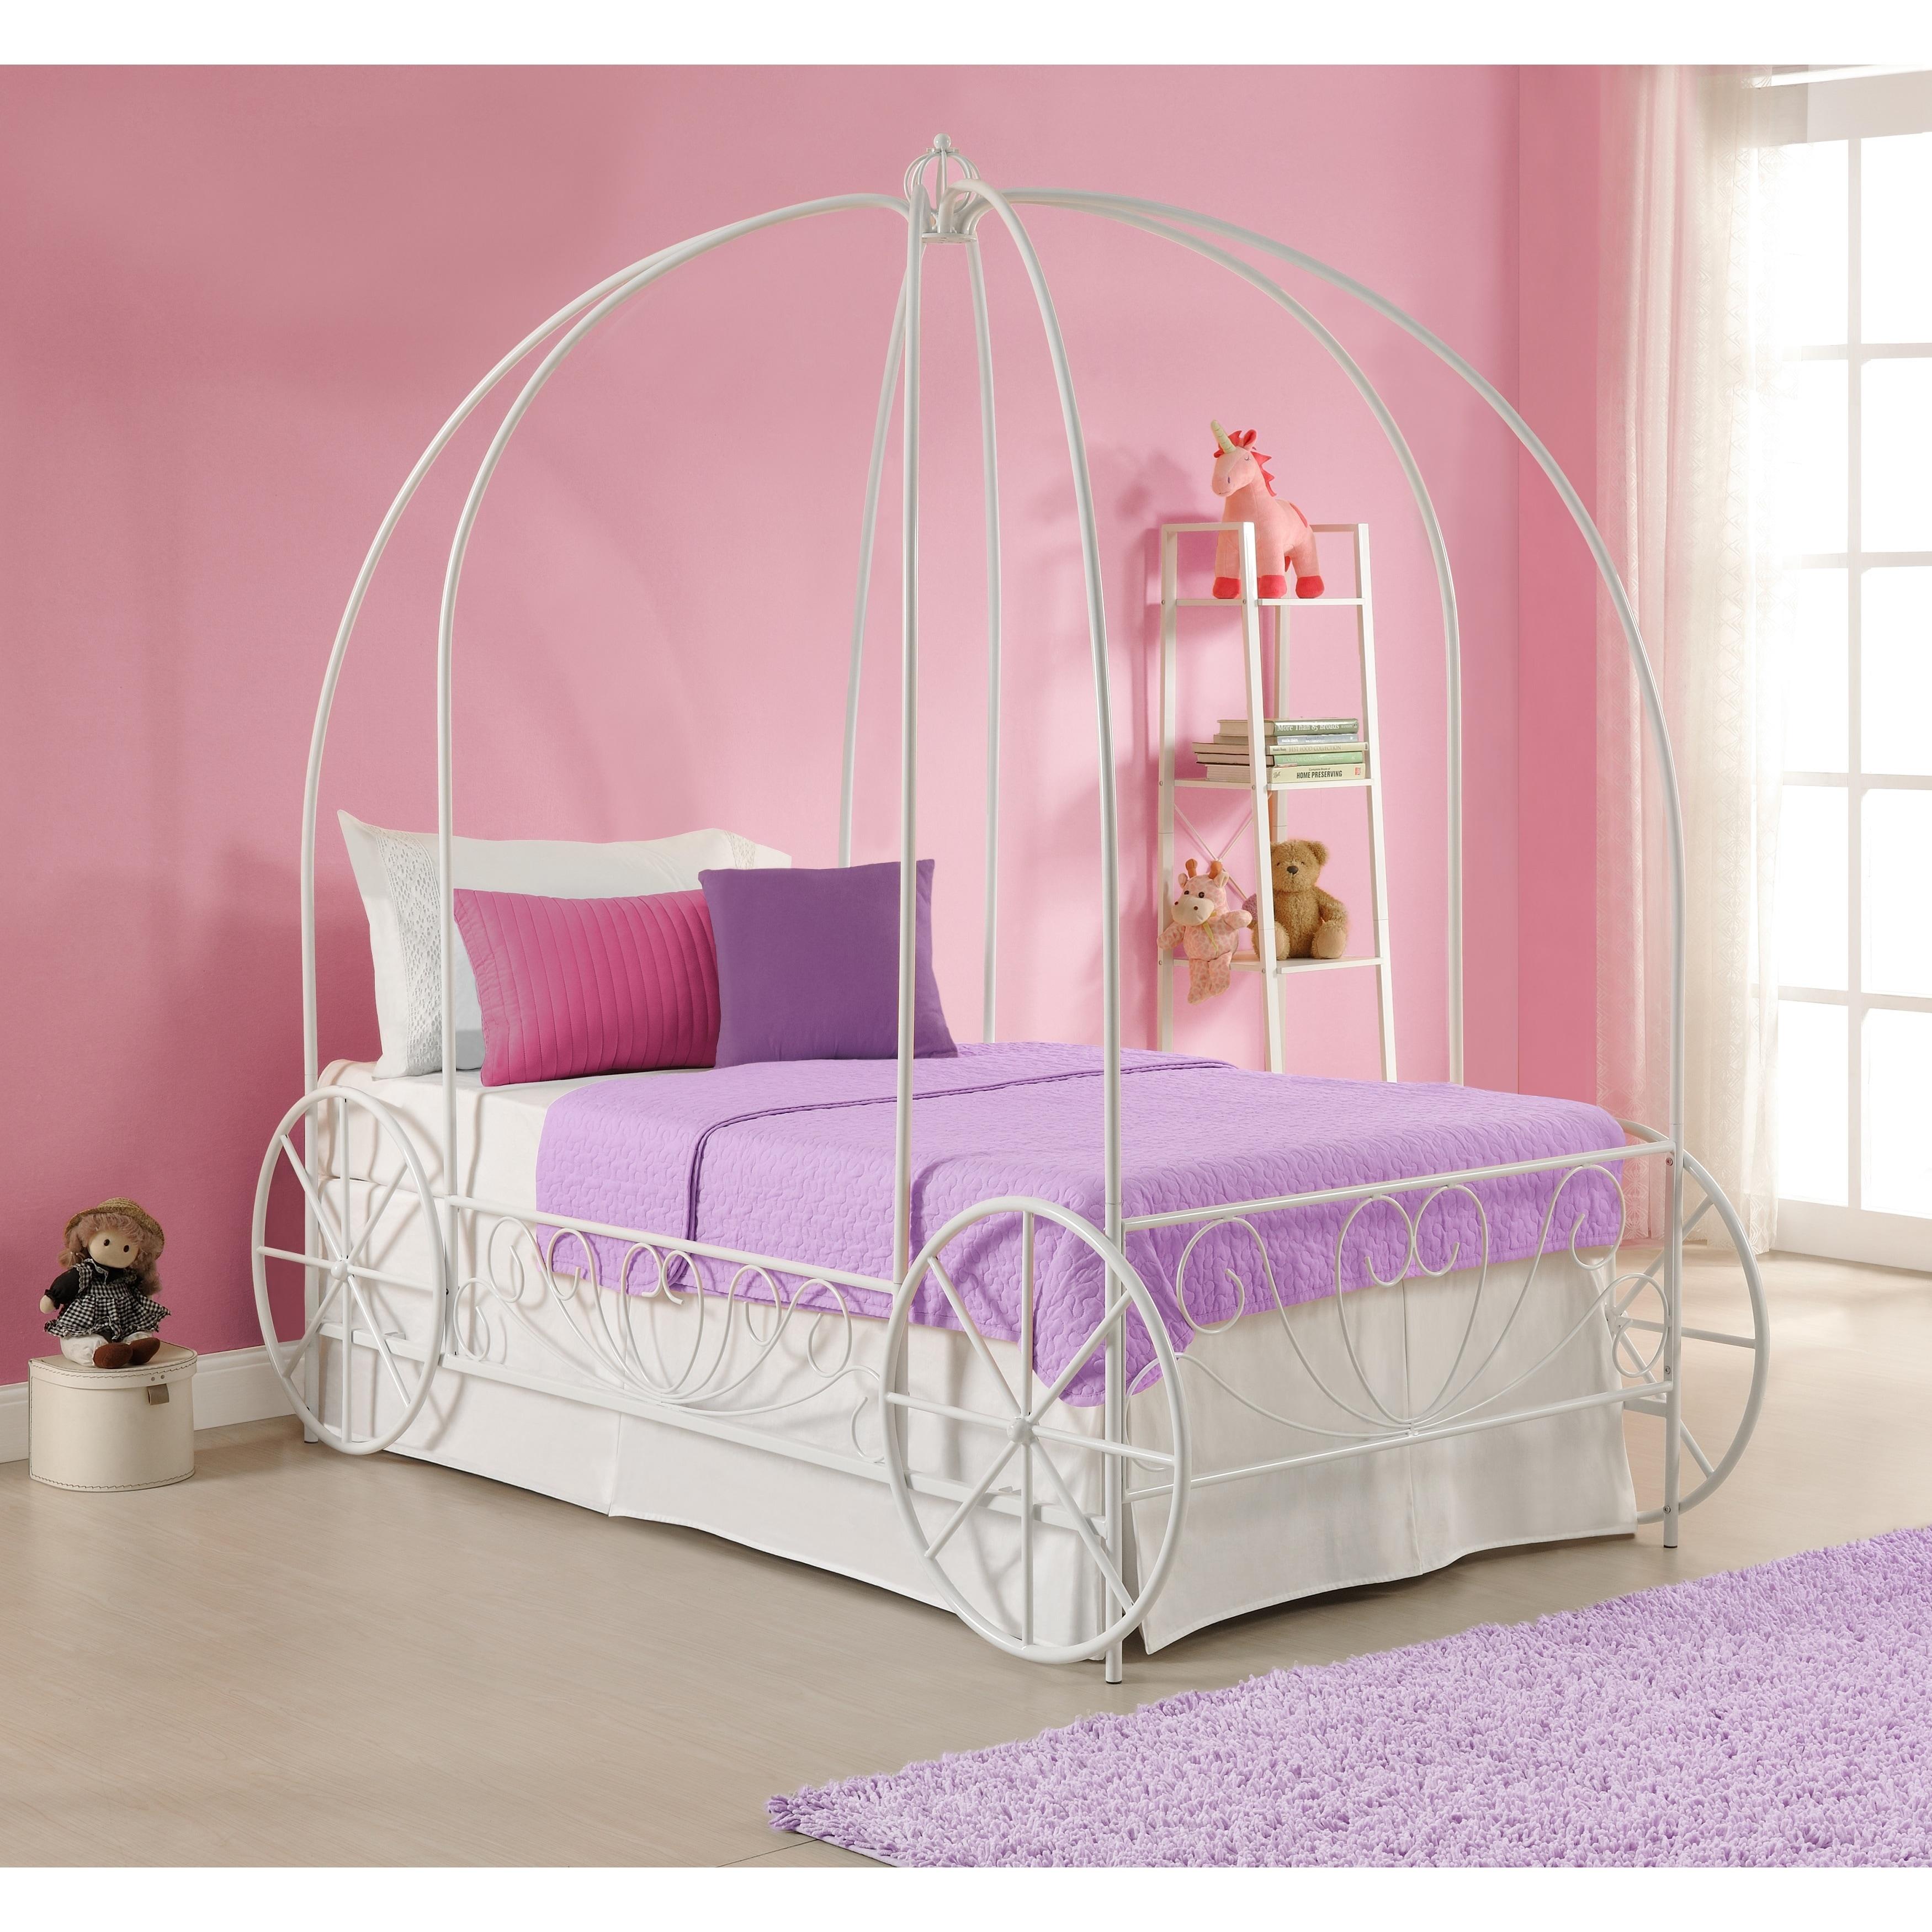 DHP Princess Carriage Twin Metal Bed (Twin, White Metal Bed)